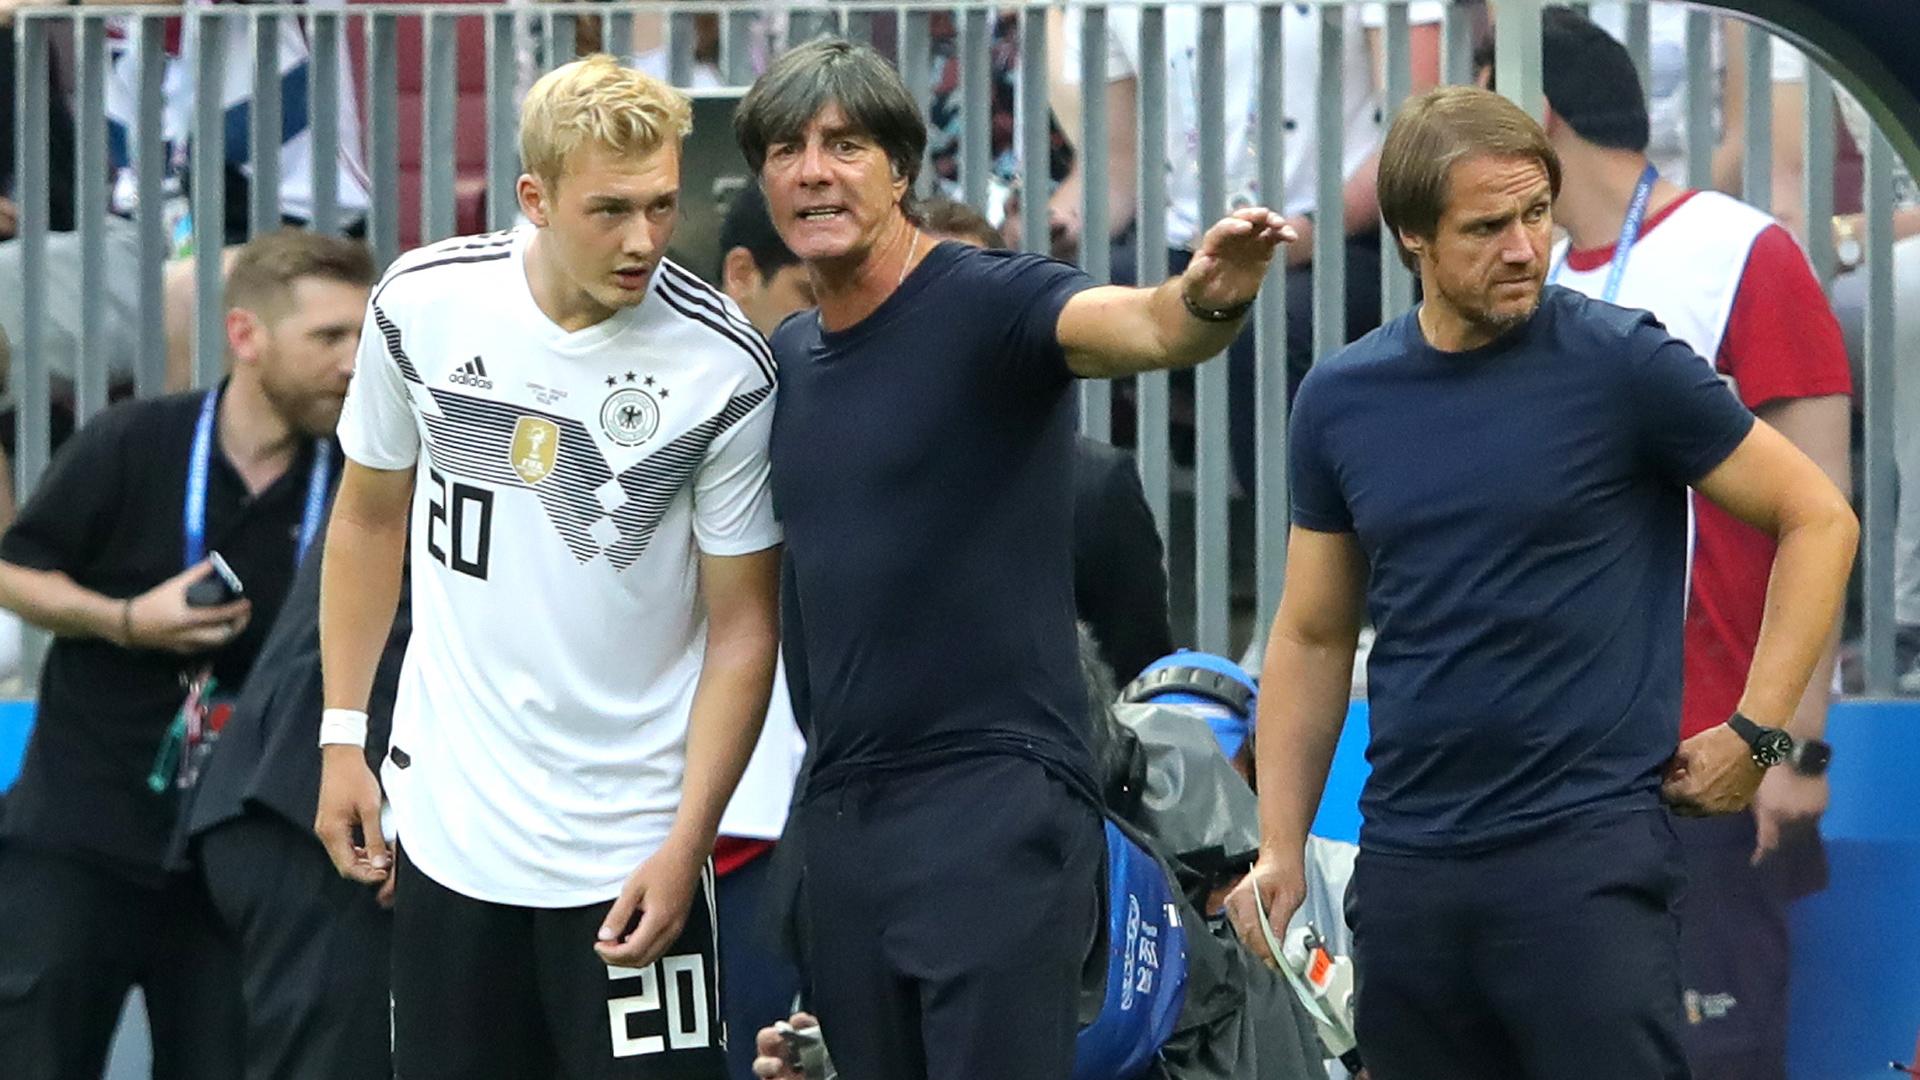 Image result for สื่อเยอรมันสับ'บรันด์ท'ทีมแพ้แต่มีอารมณ์เซลฟี